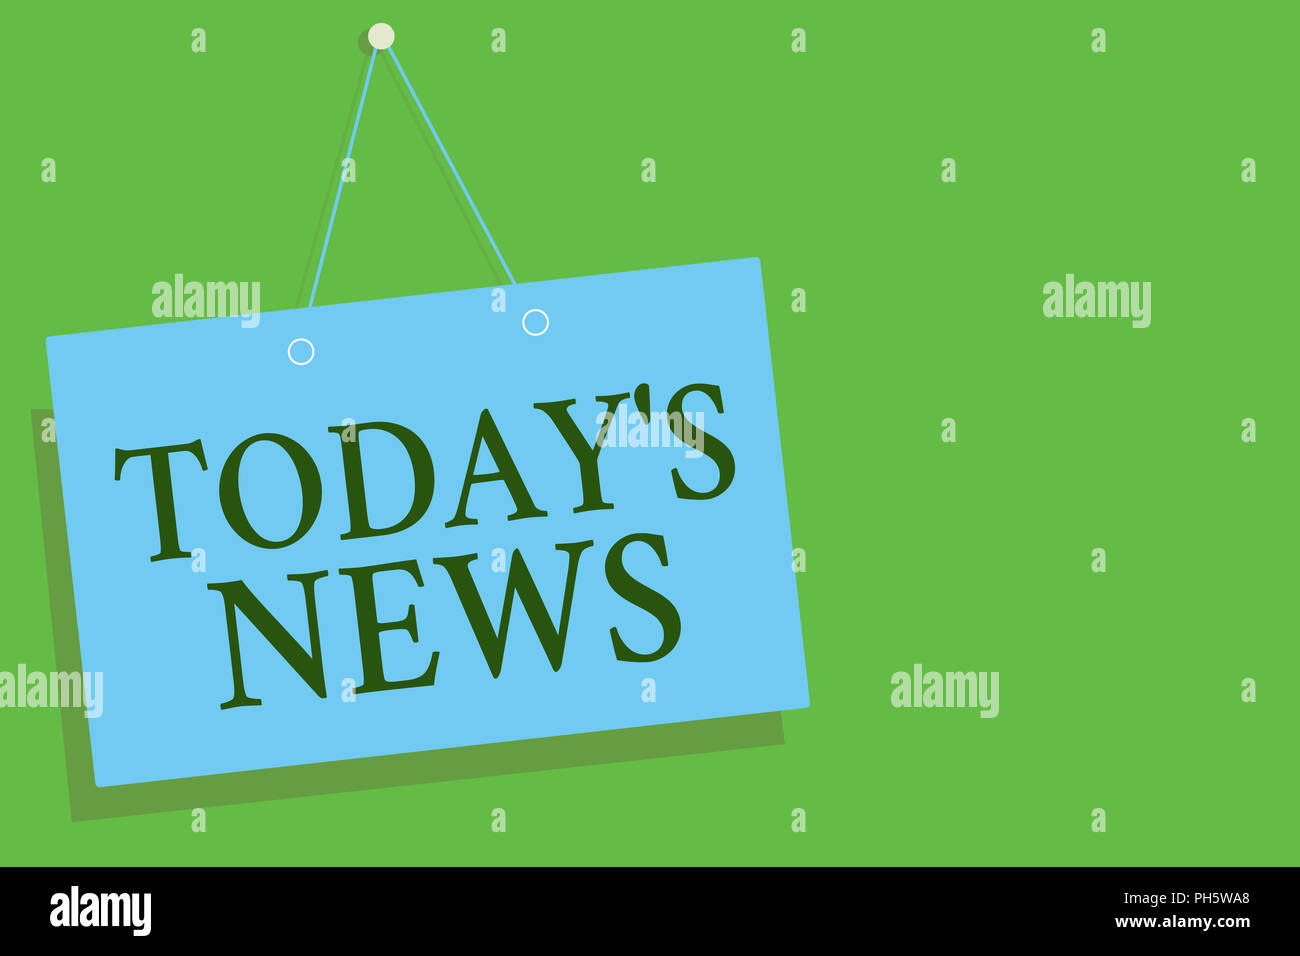 Newspaper Headlines Board Stock Photos & Newspaper ...